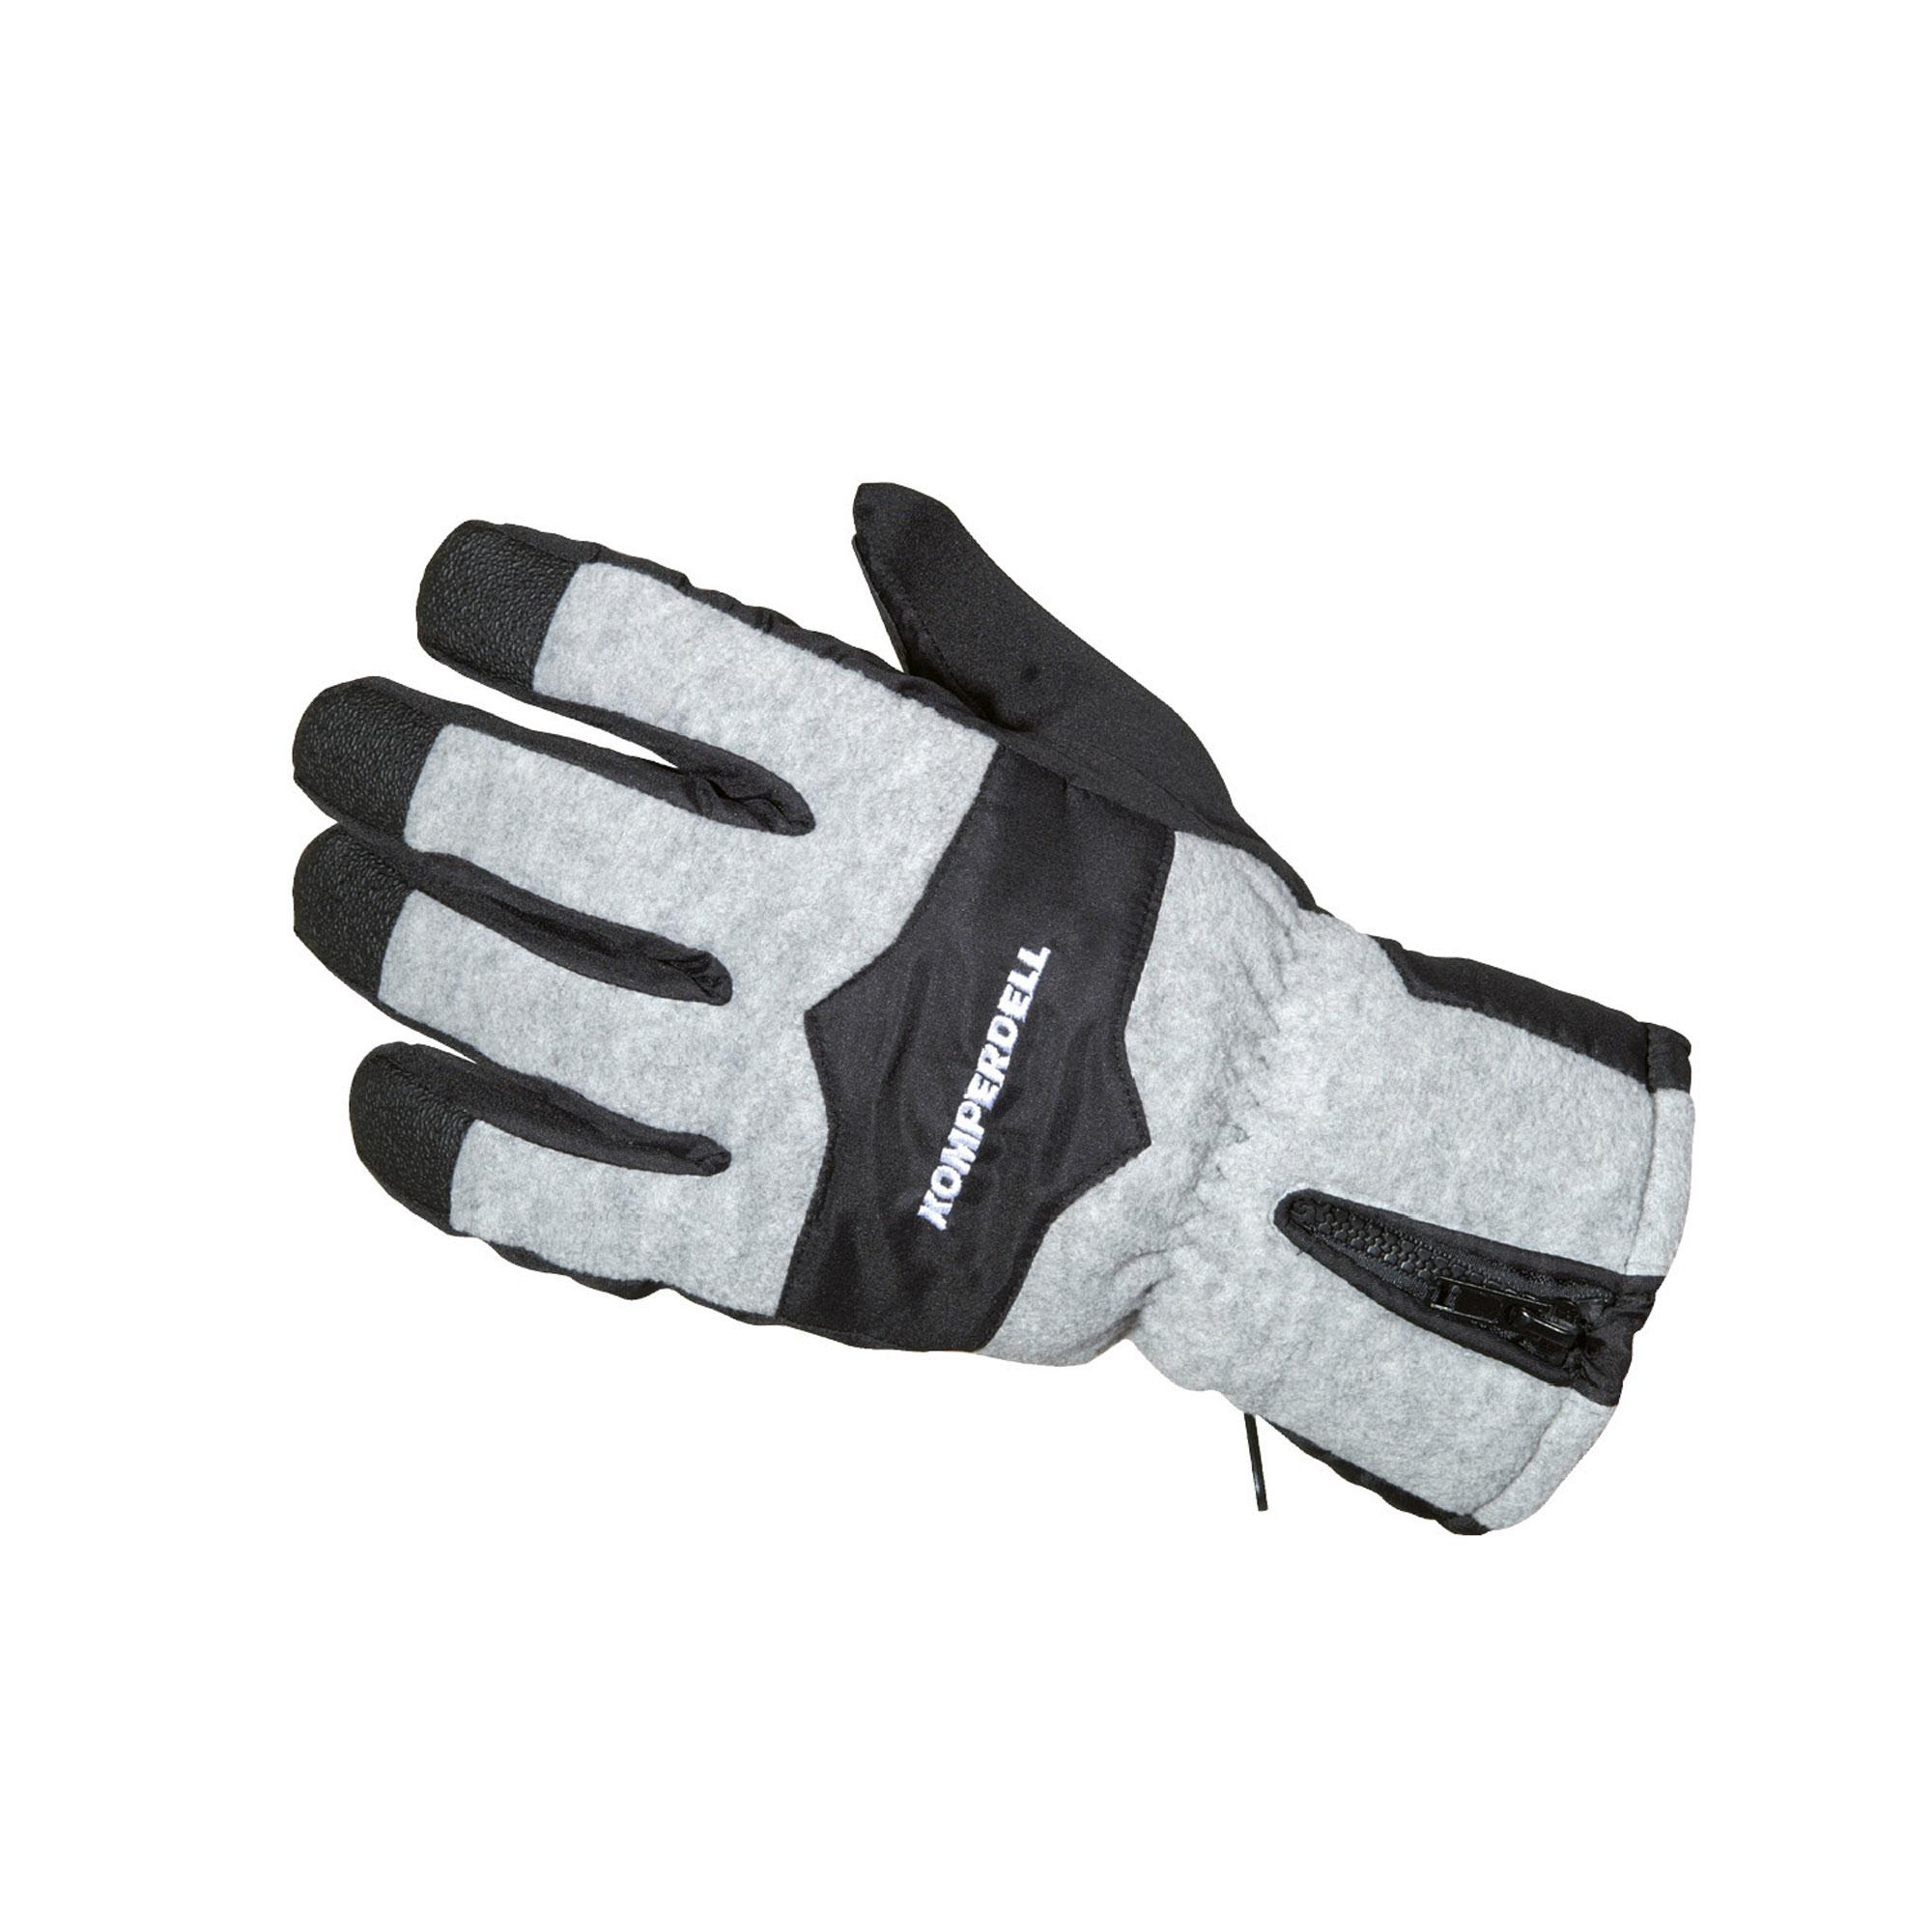 Komperdell X-Moves Handschuh